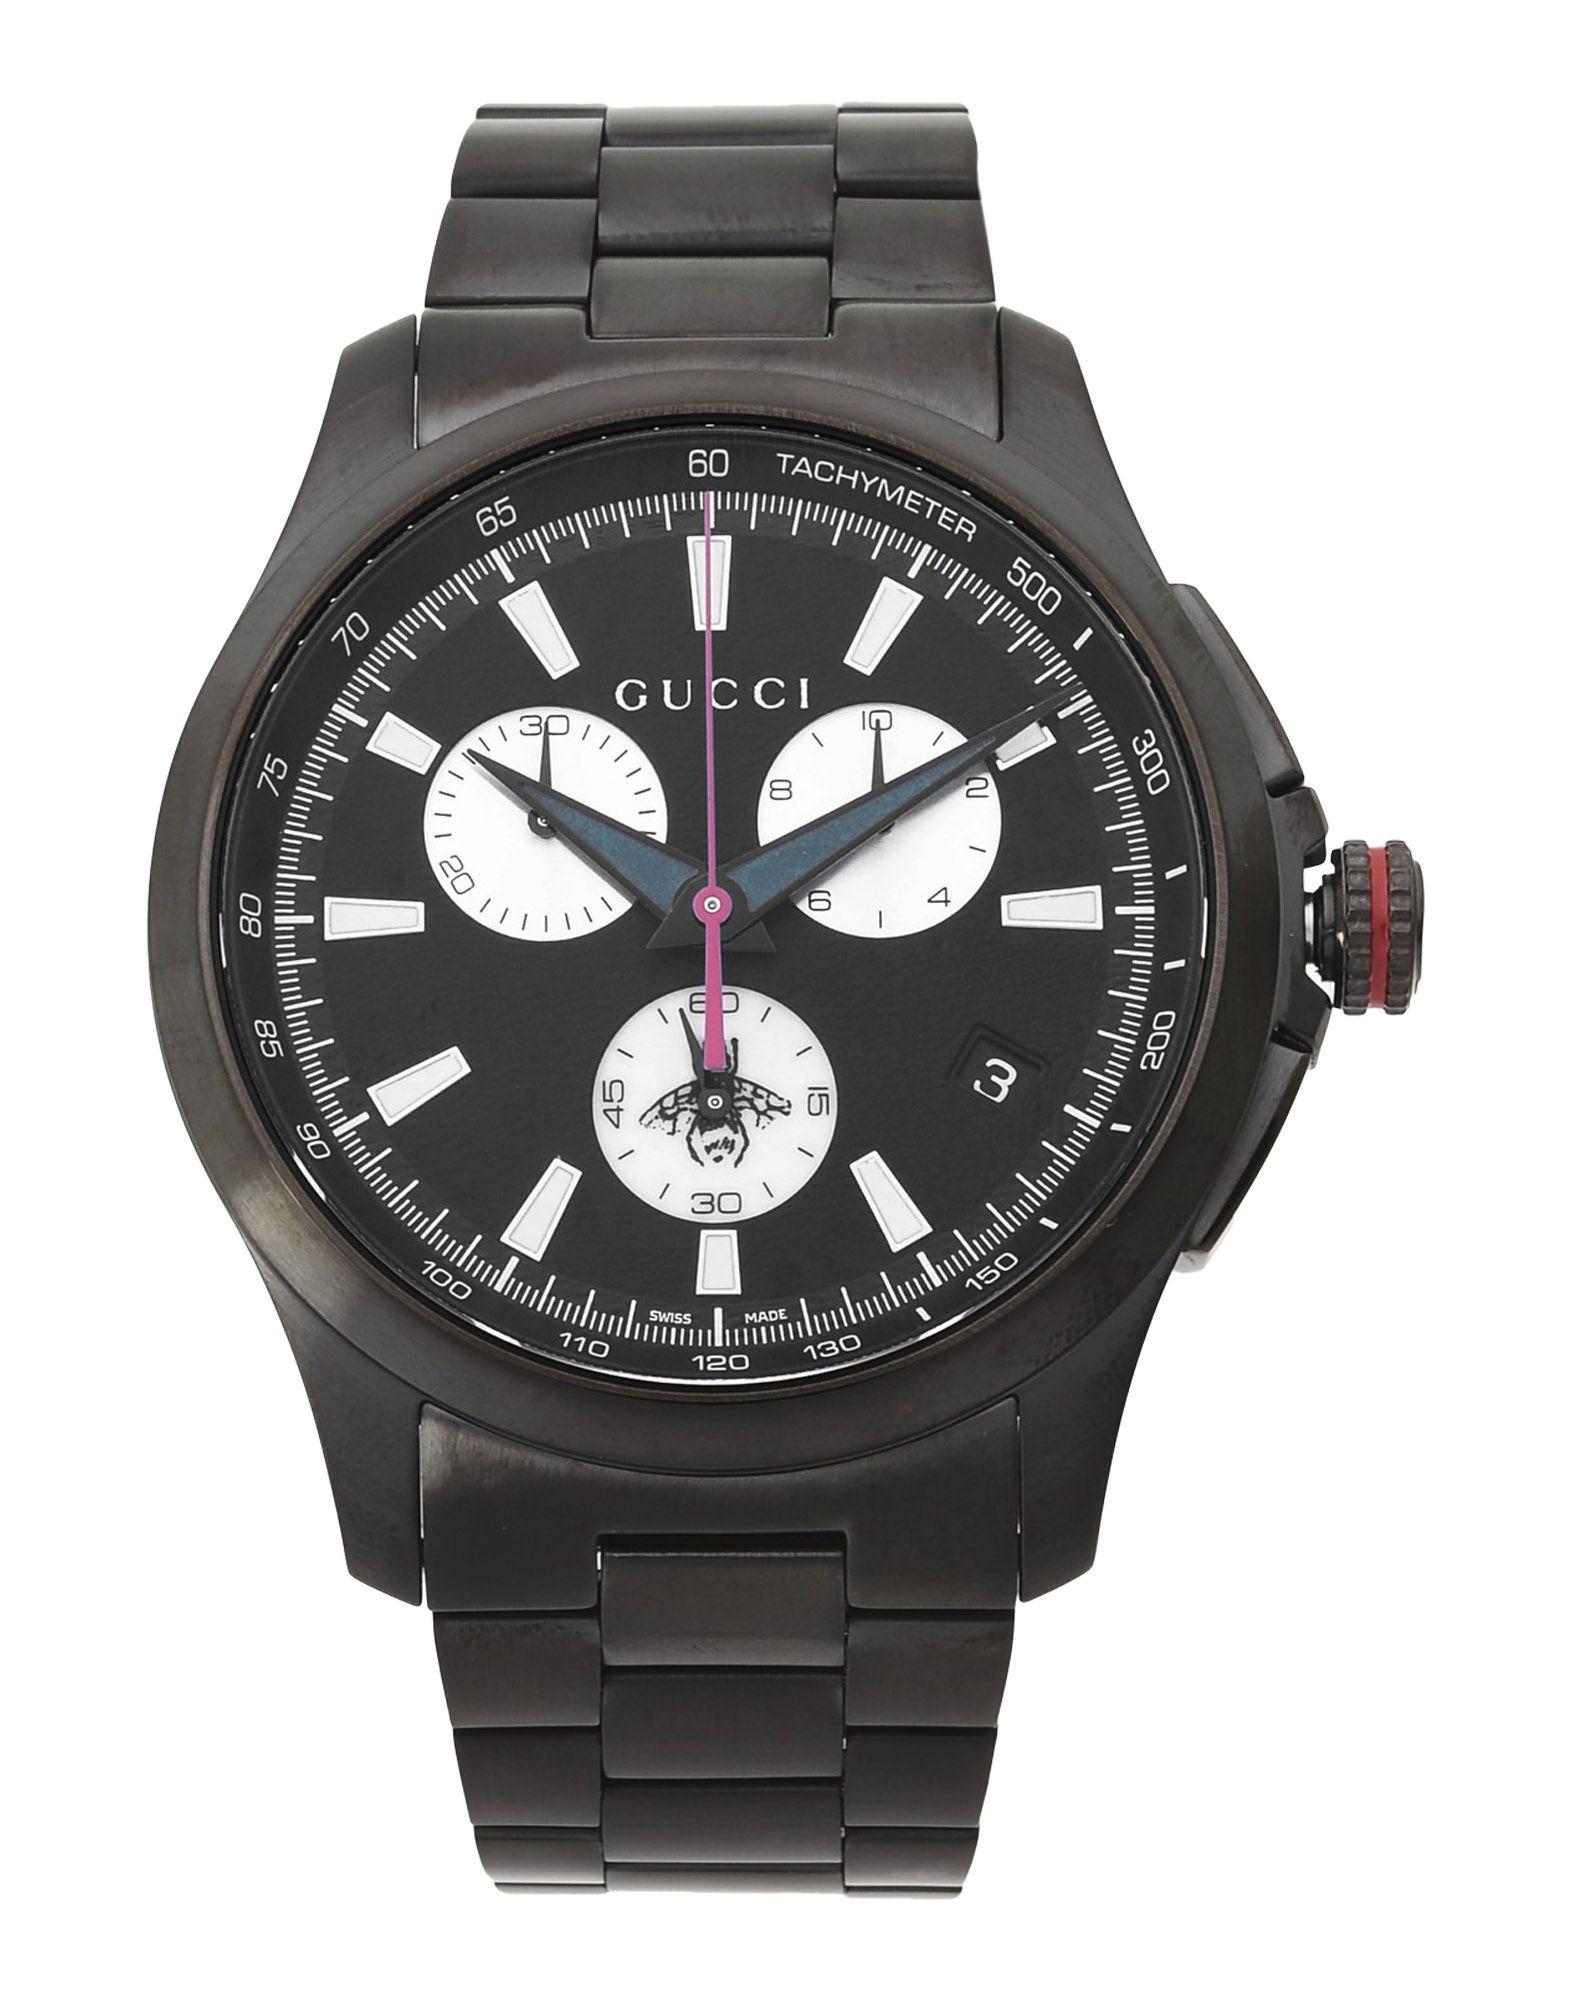 841ad8e284 Reloj De Pulsera Gucci G-Timeless - Hombre - Relojes De Pulsera ...